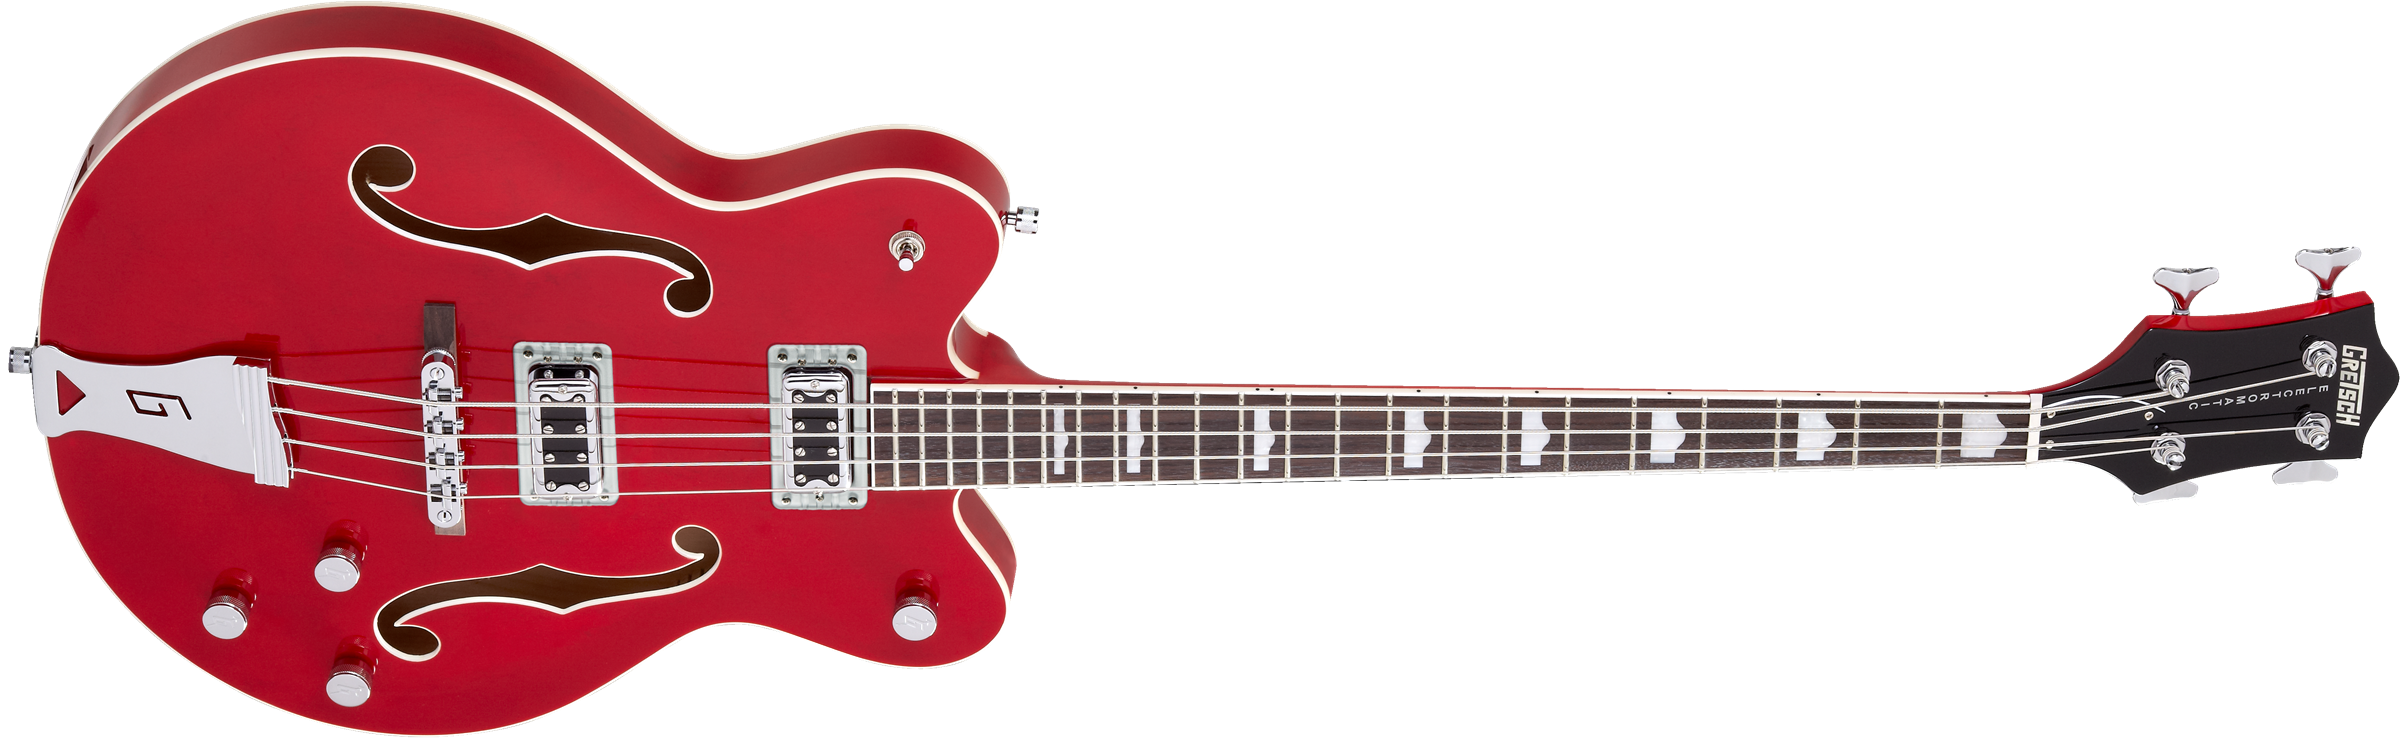 Gretsch G5442BDC Electromatic® Hollow Body Short-Scale Bass